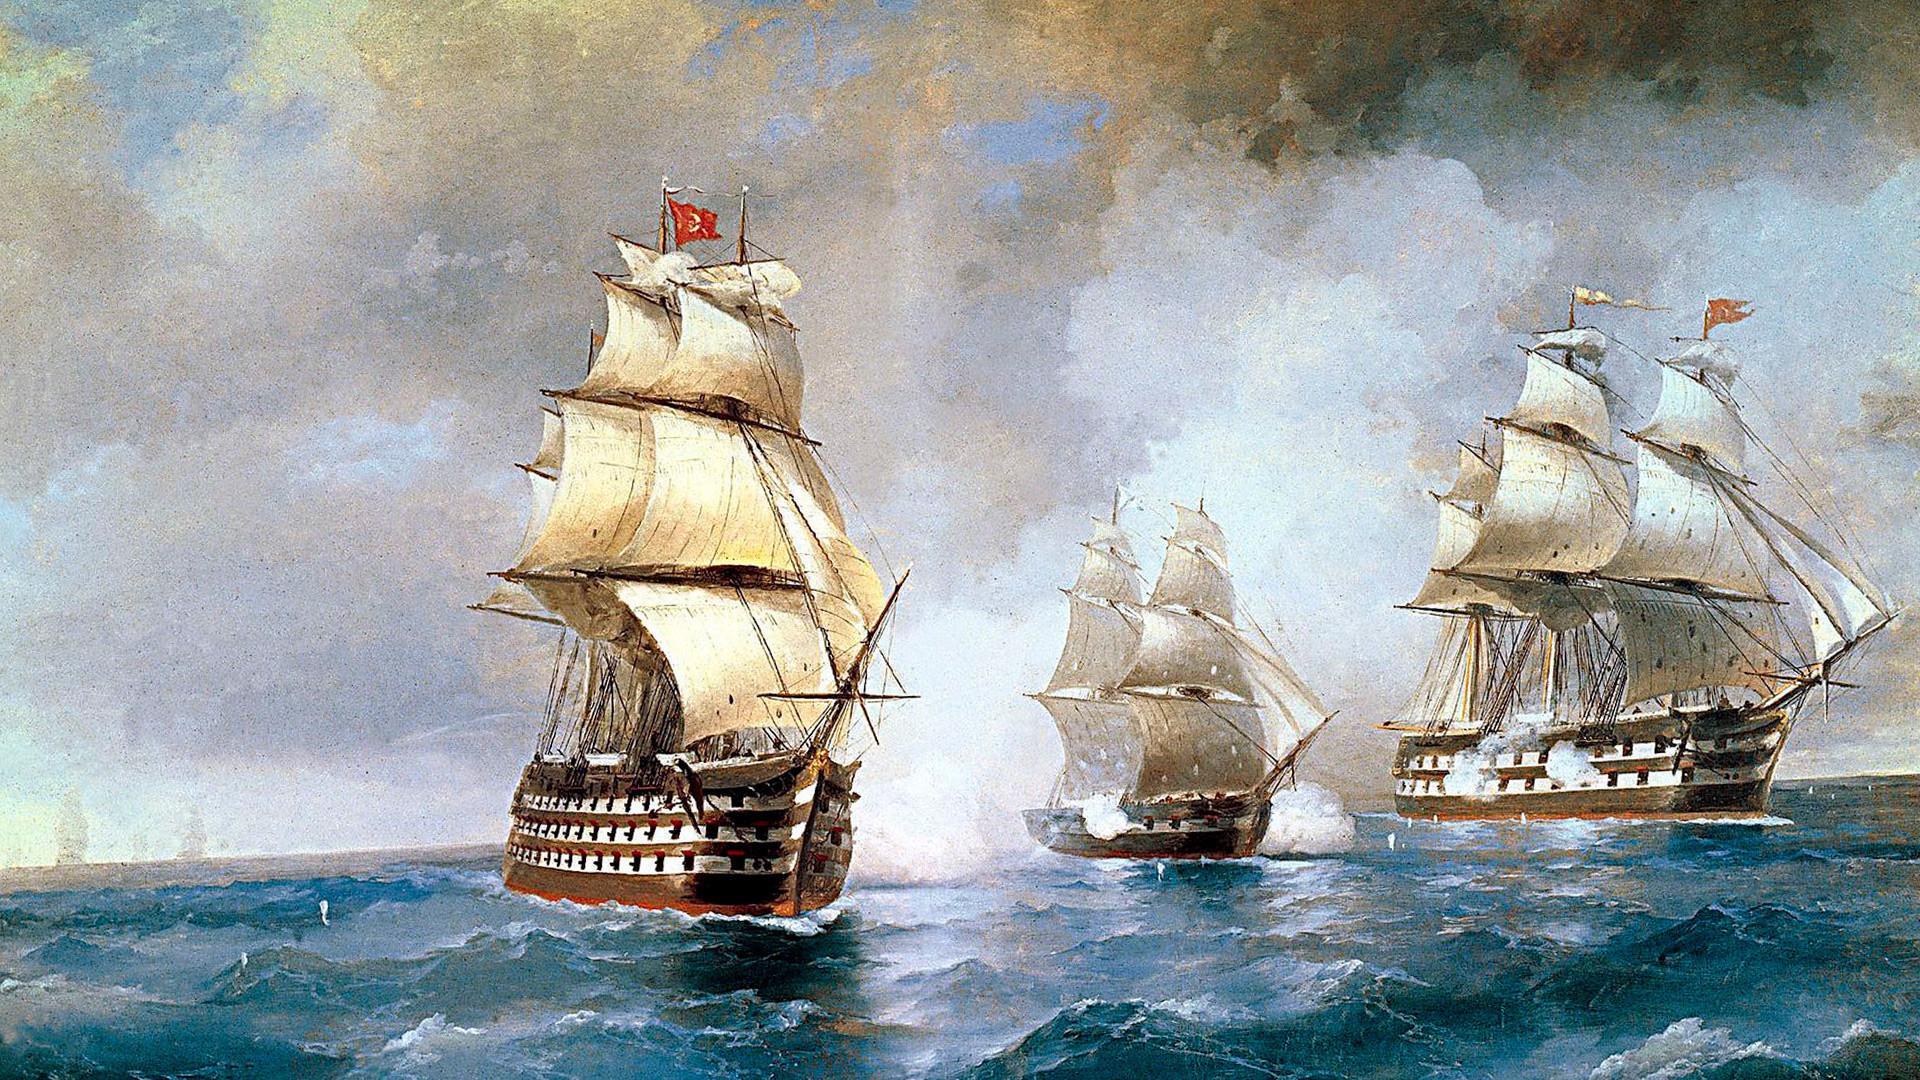 Merkurij med napadom turških ladij